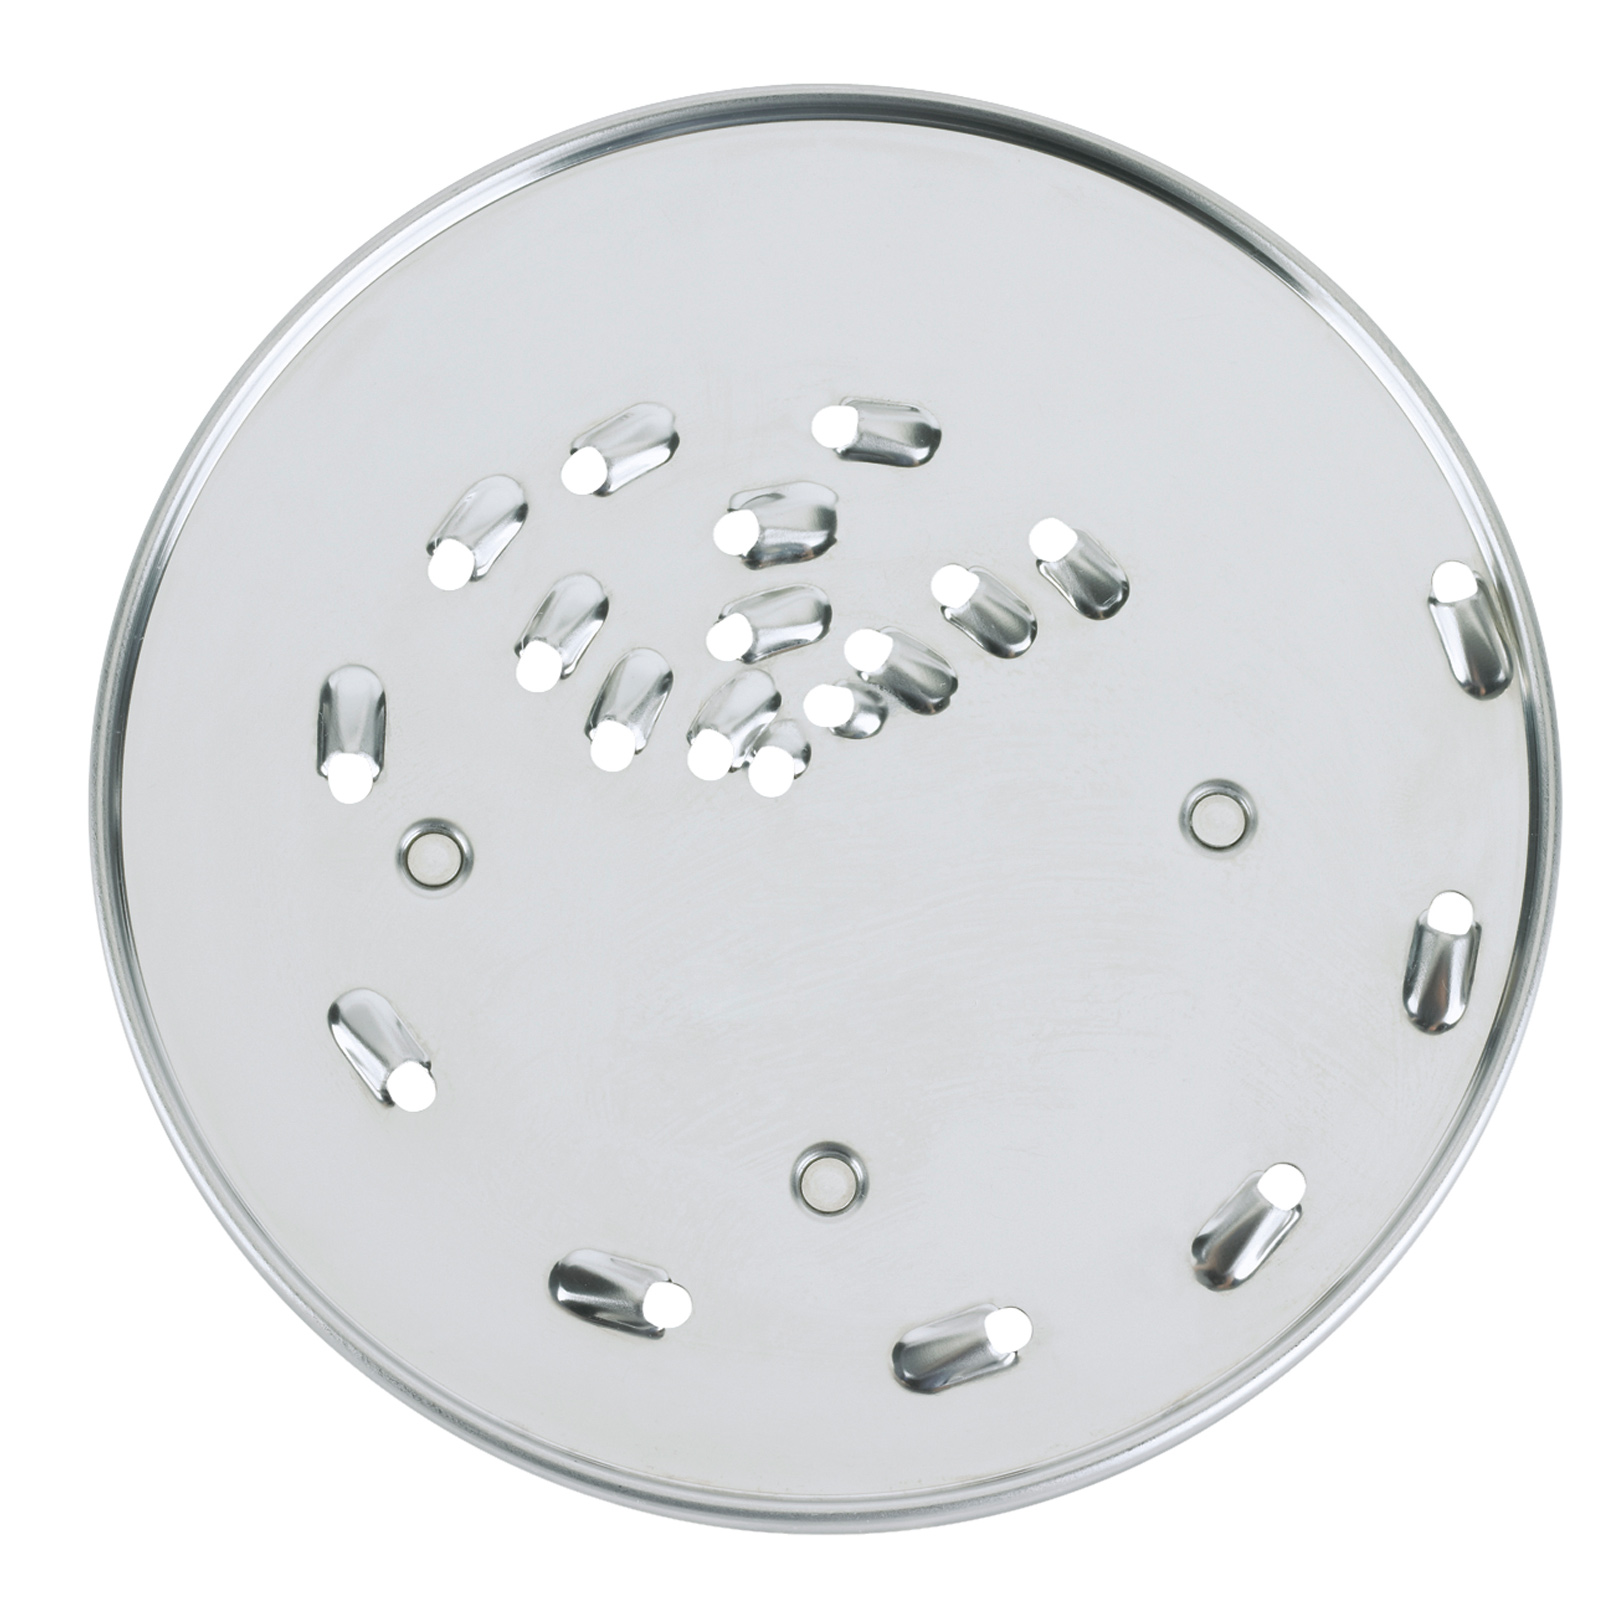 Waring WFP144 food processor, disc plate, shredding / grating